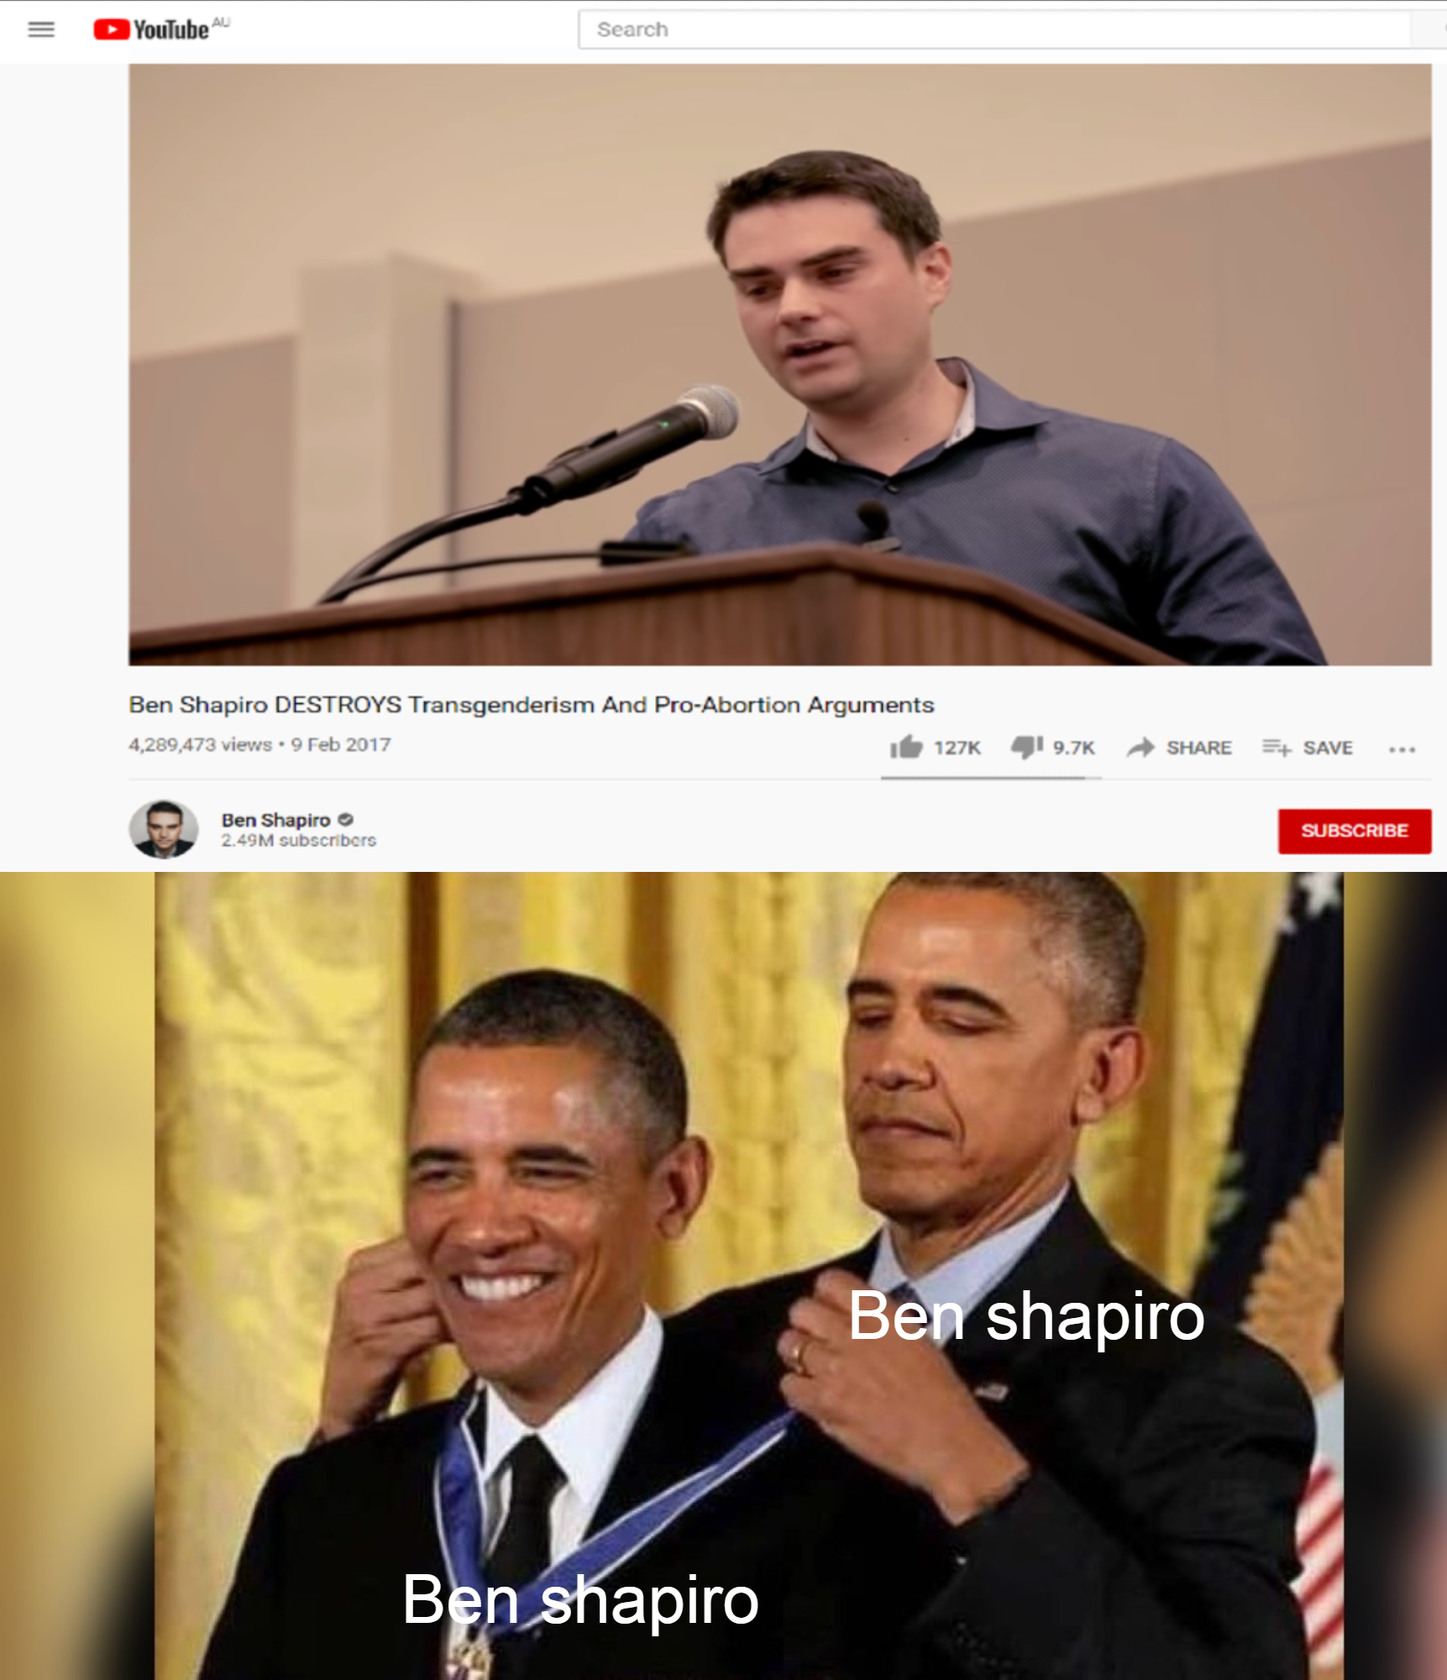 It's an old video but I don't watch Shapiro so shut up - meme